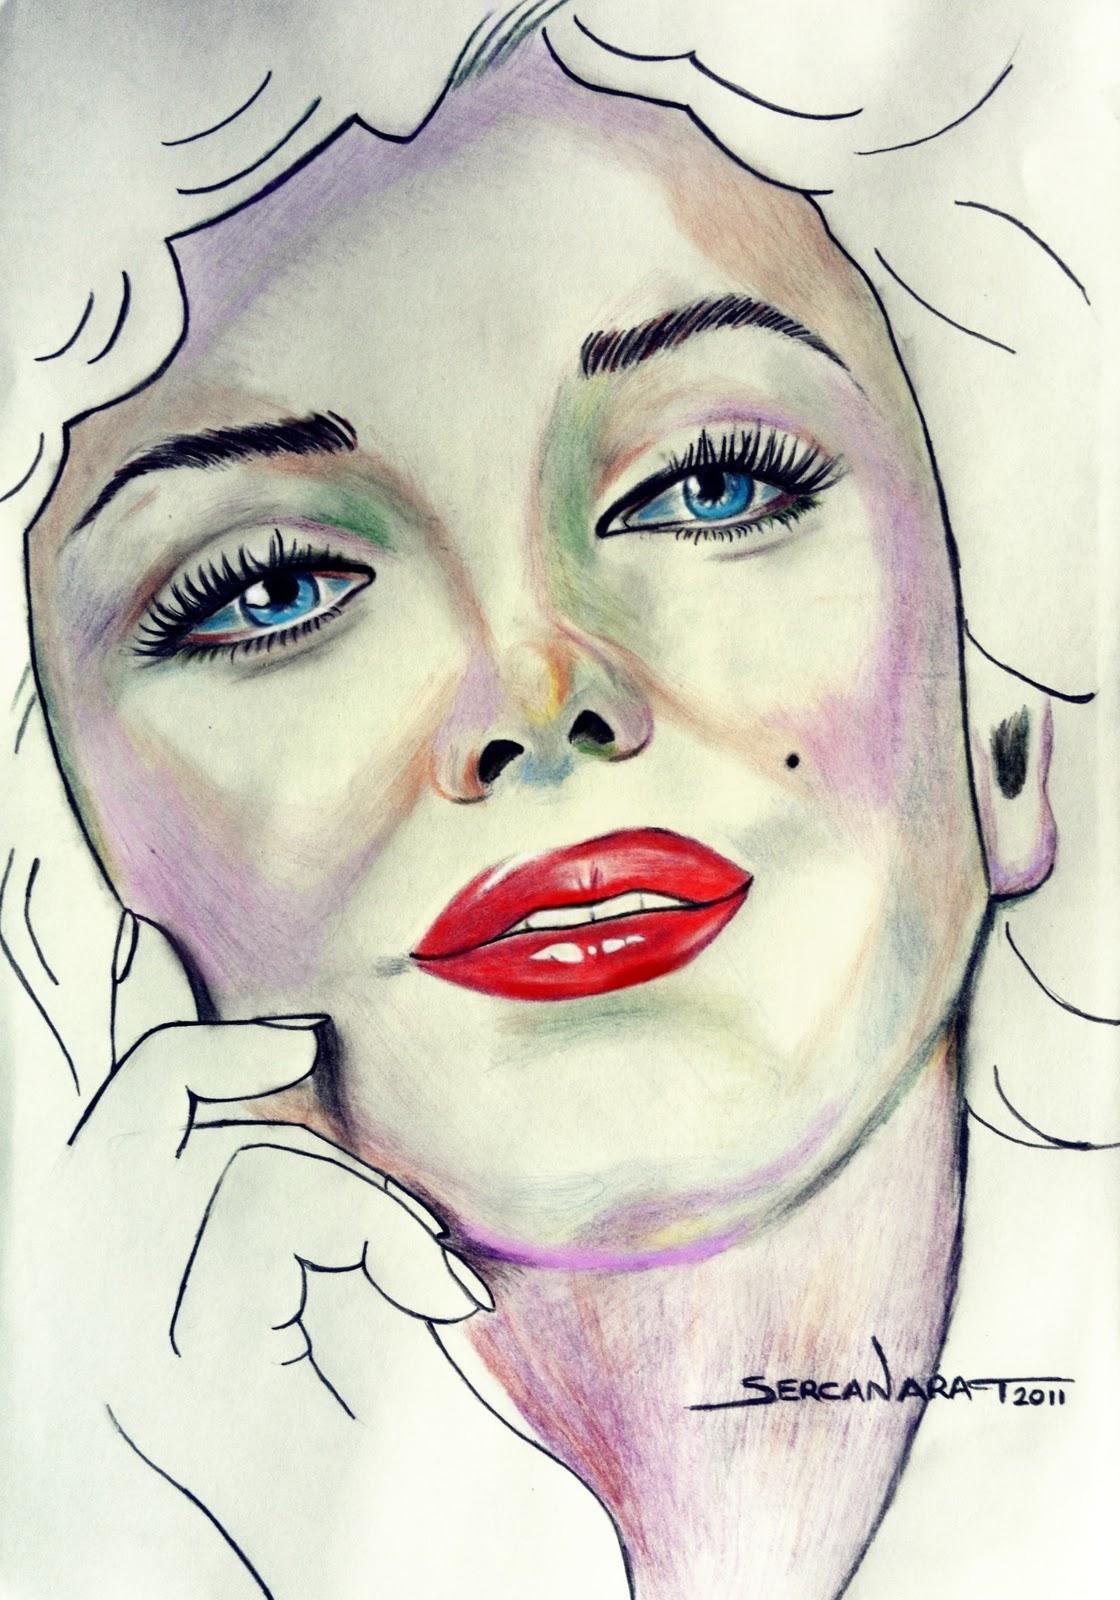 http://4.bp.blogspot.com/-GCMLpb2KLRA/TrlOnlIXV0I/AAAAAAAAAYE/_lSlp74n5FI/s1600/Marilyn+Monroe.jpg